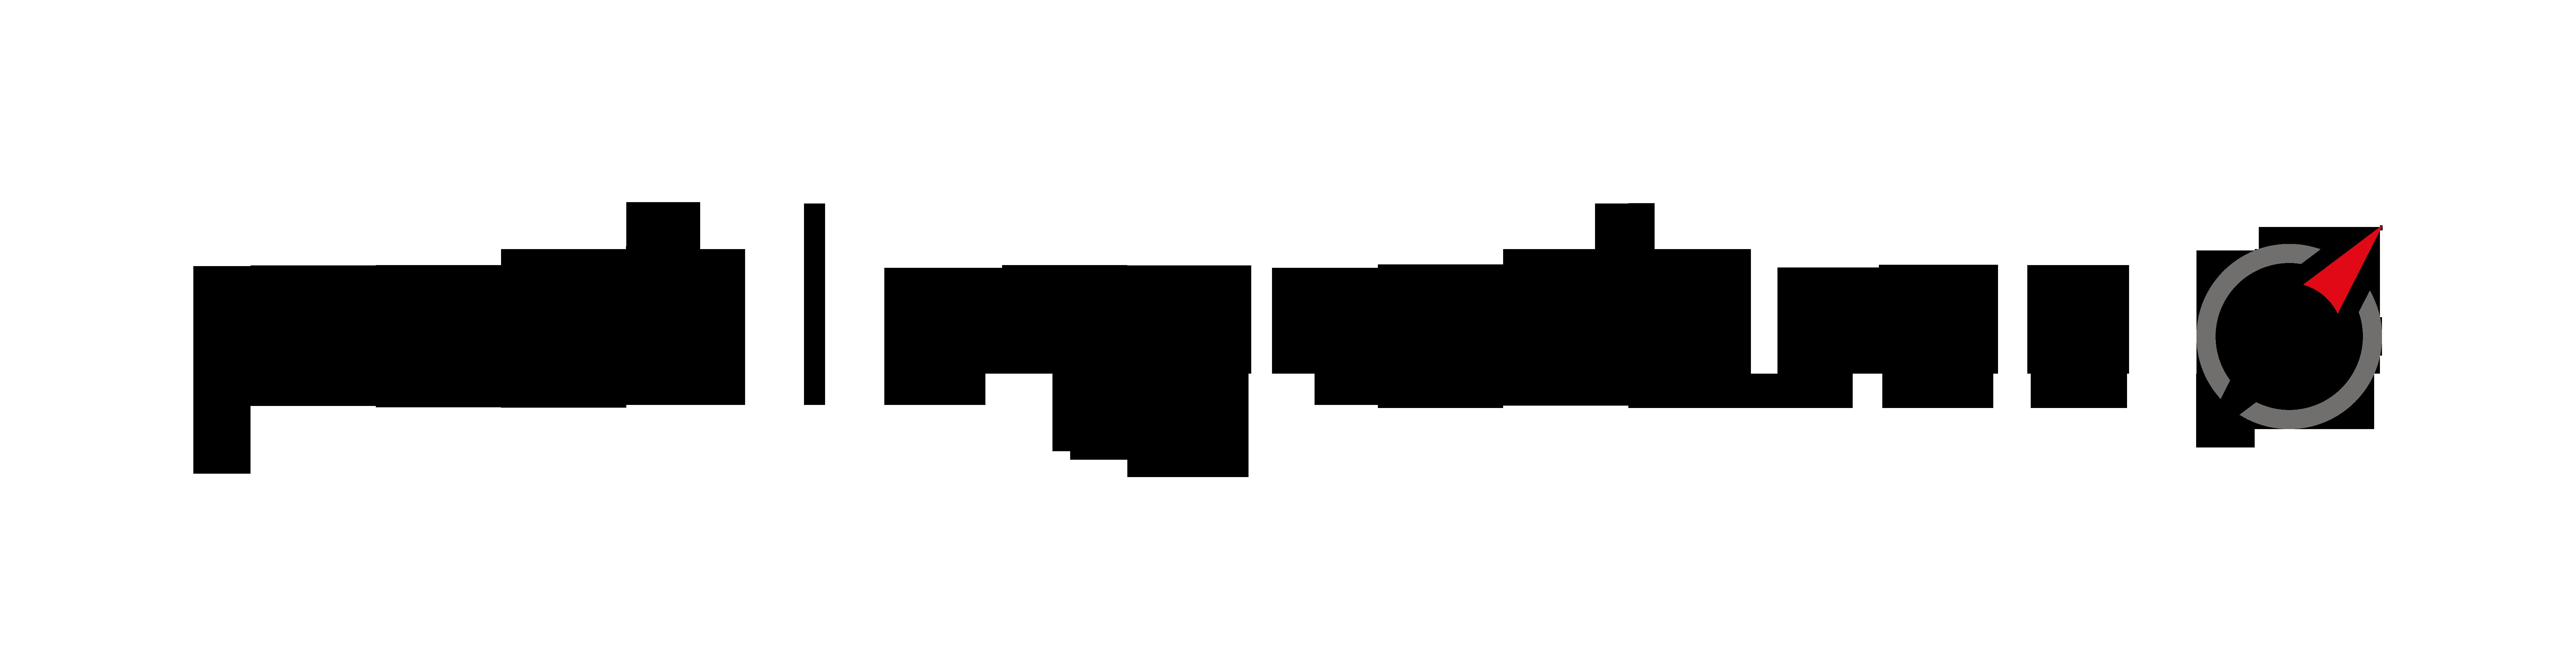 Logo profilingvalues Diagnostik